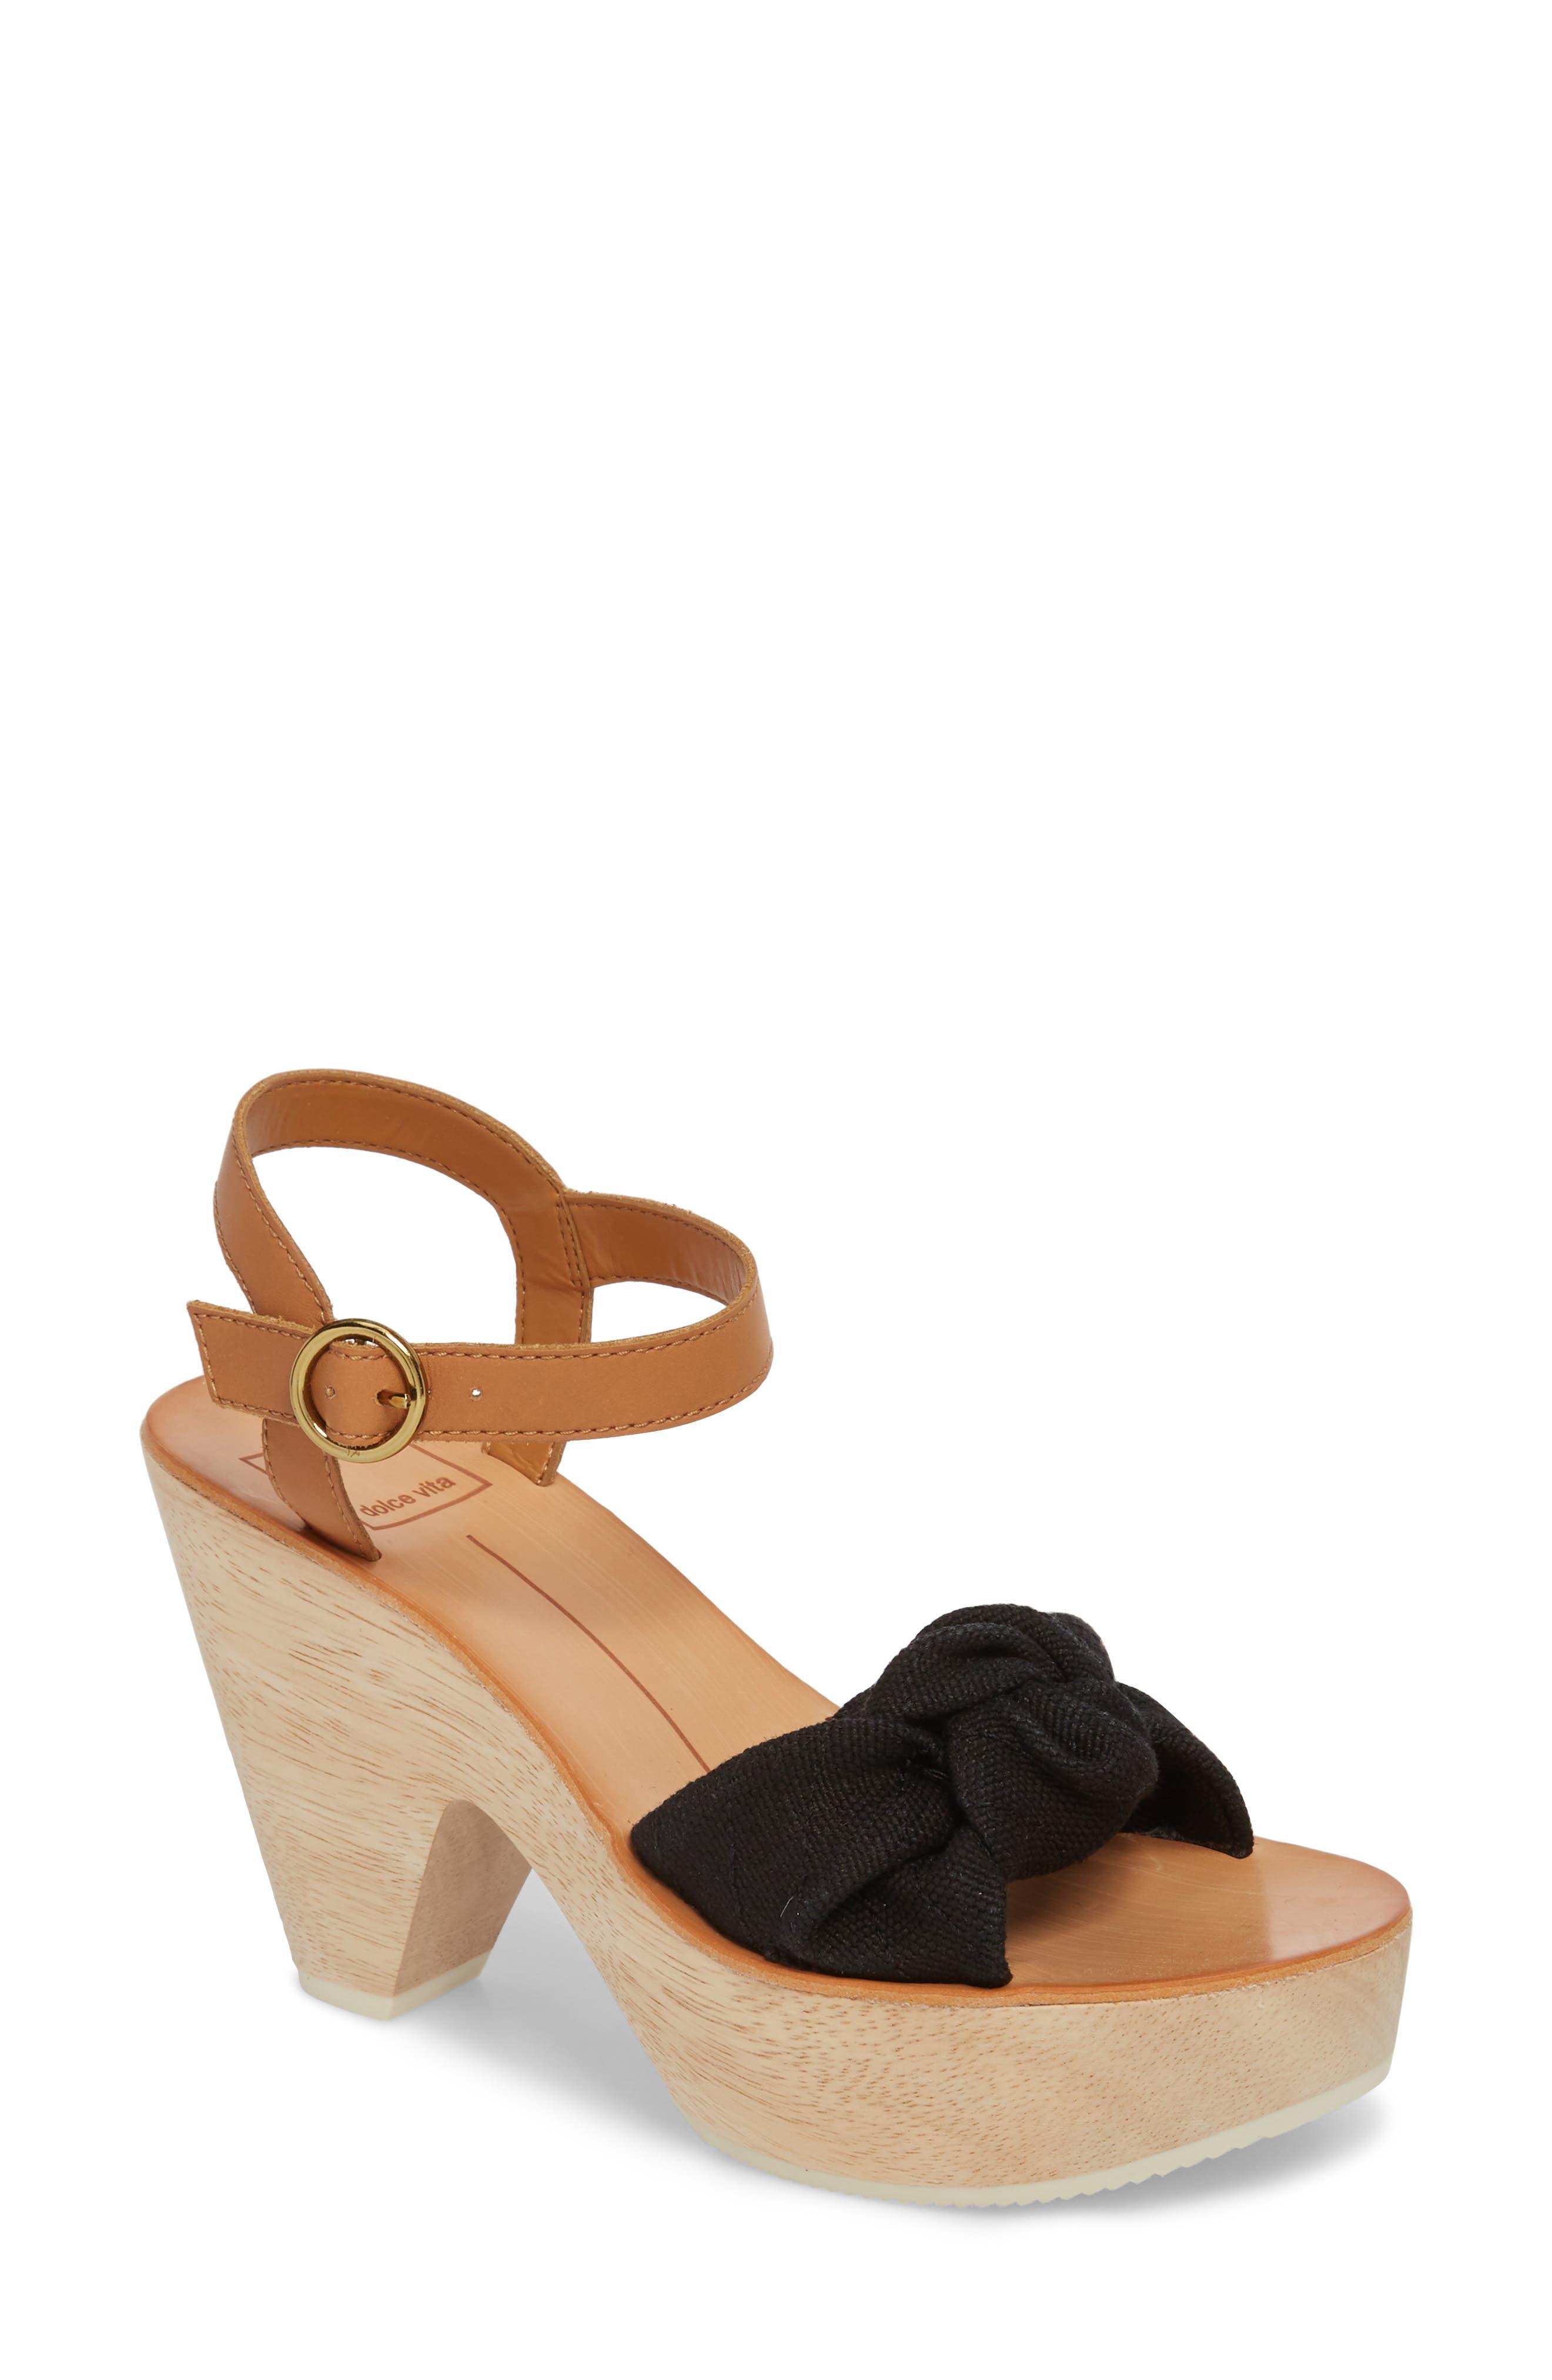 Shia Knotted Platform Sandal,                         Main,                         color, Black Linen